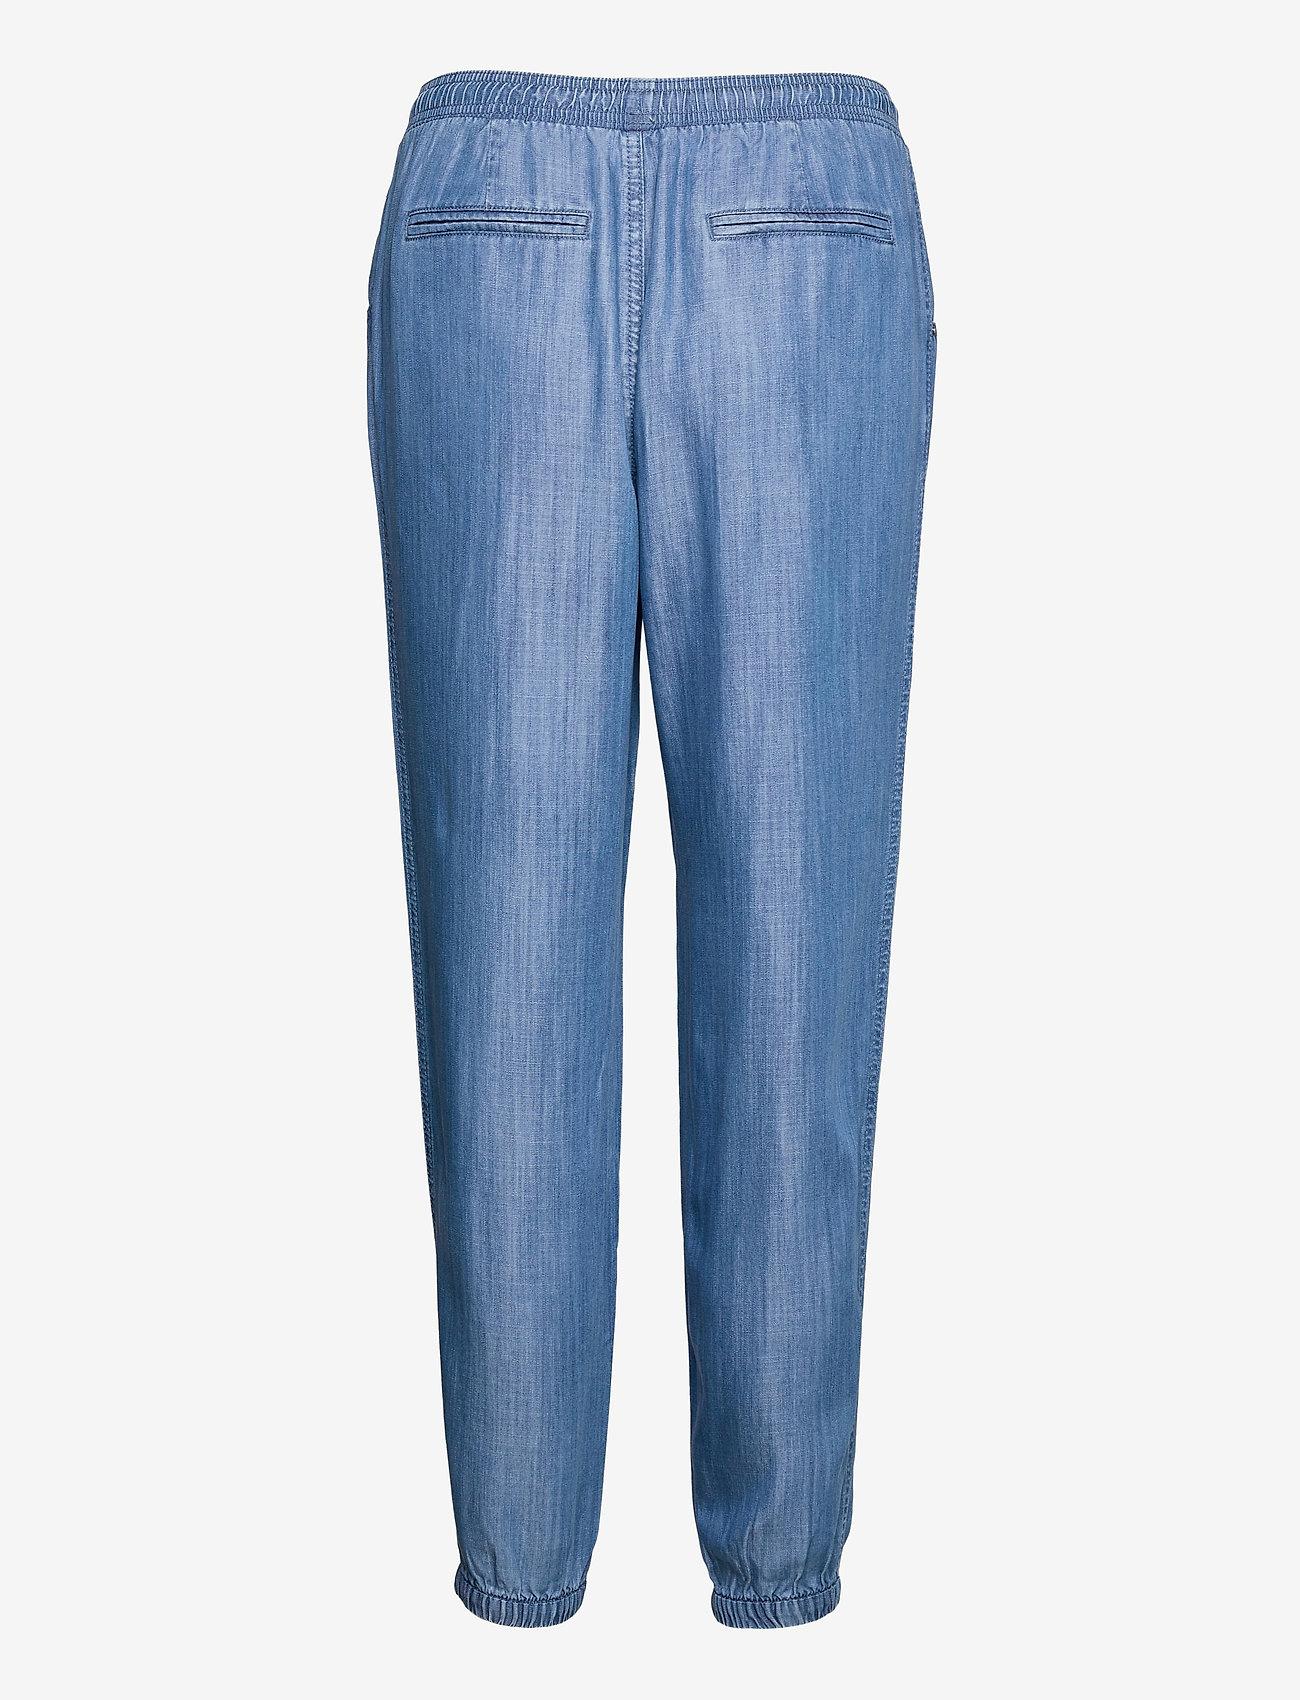 Esprit Casual - Pants denim - straight regular - blue medium wash - 1